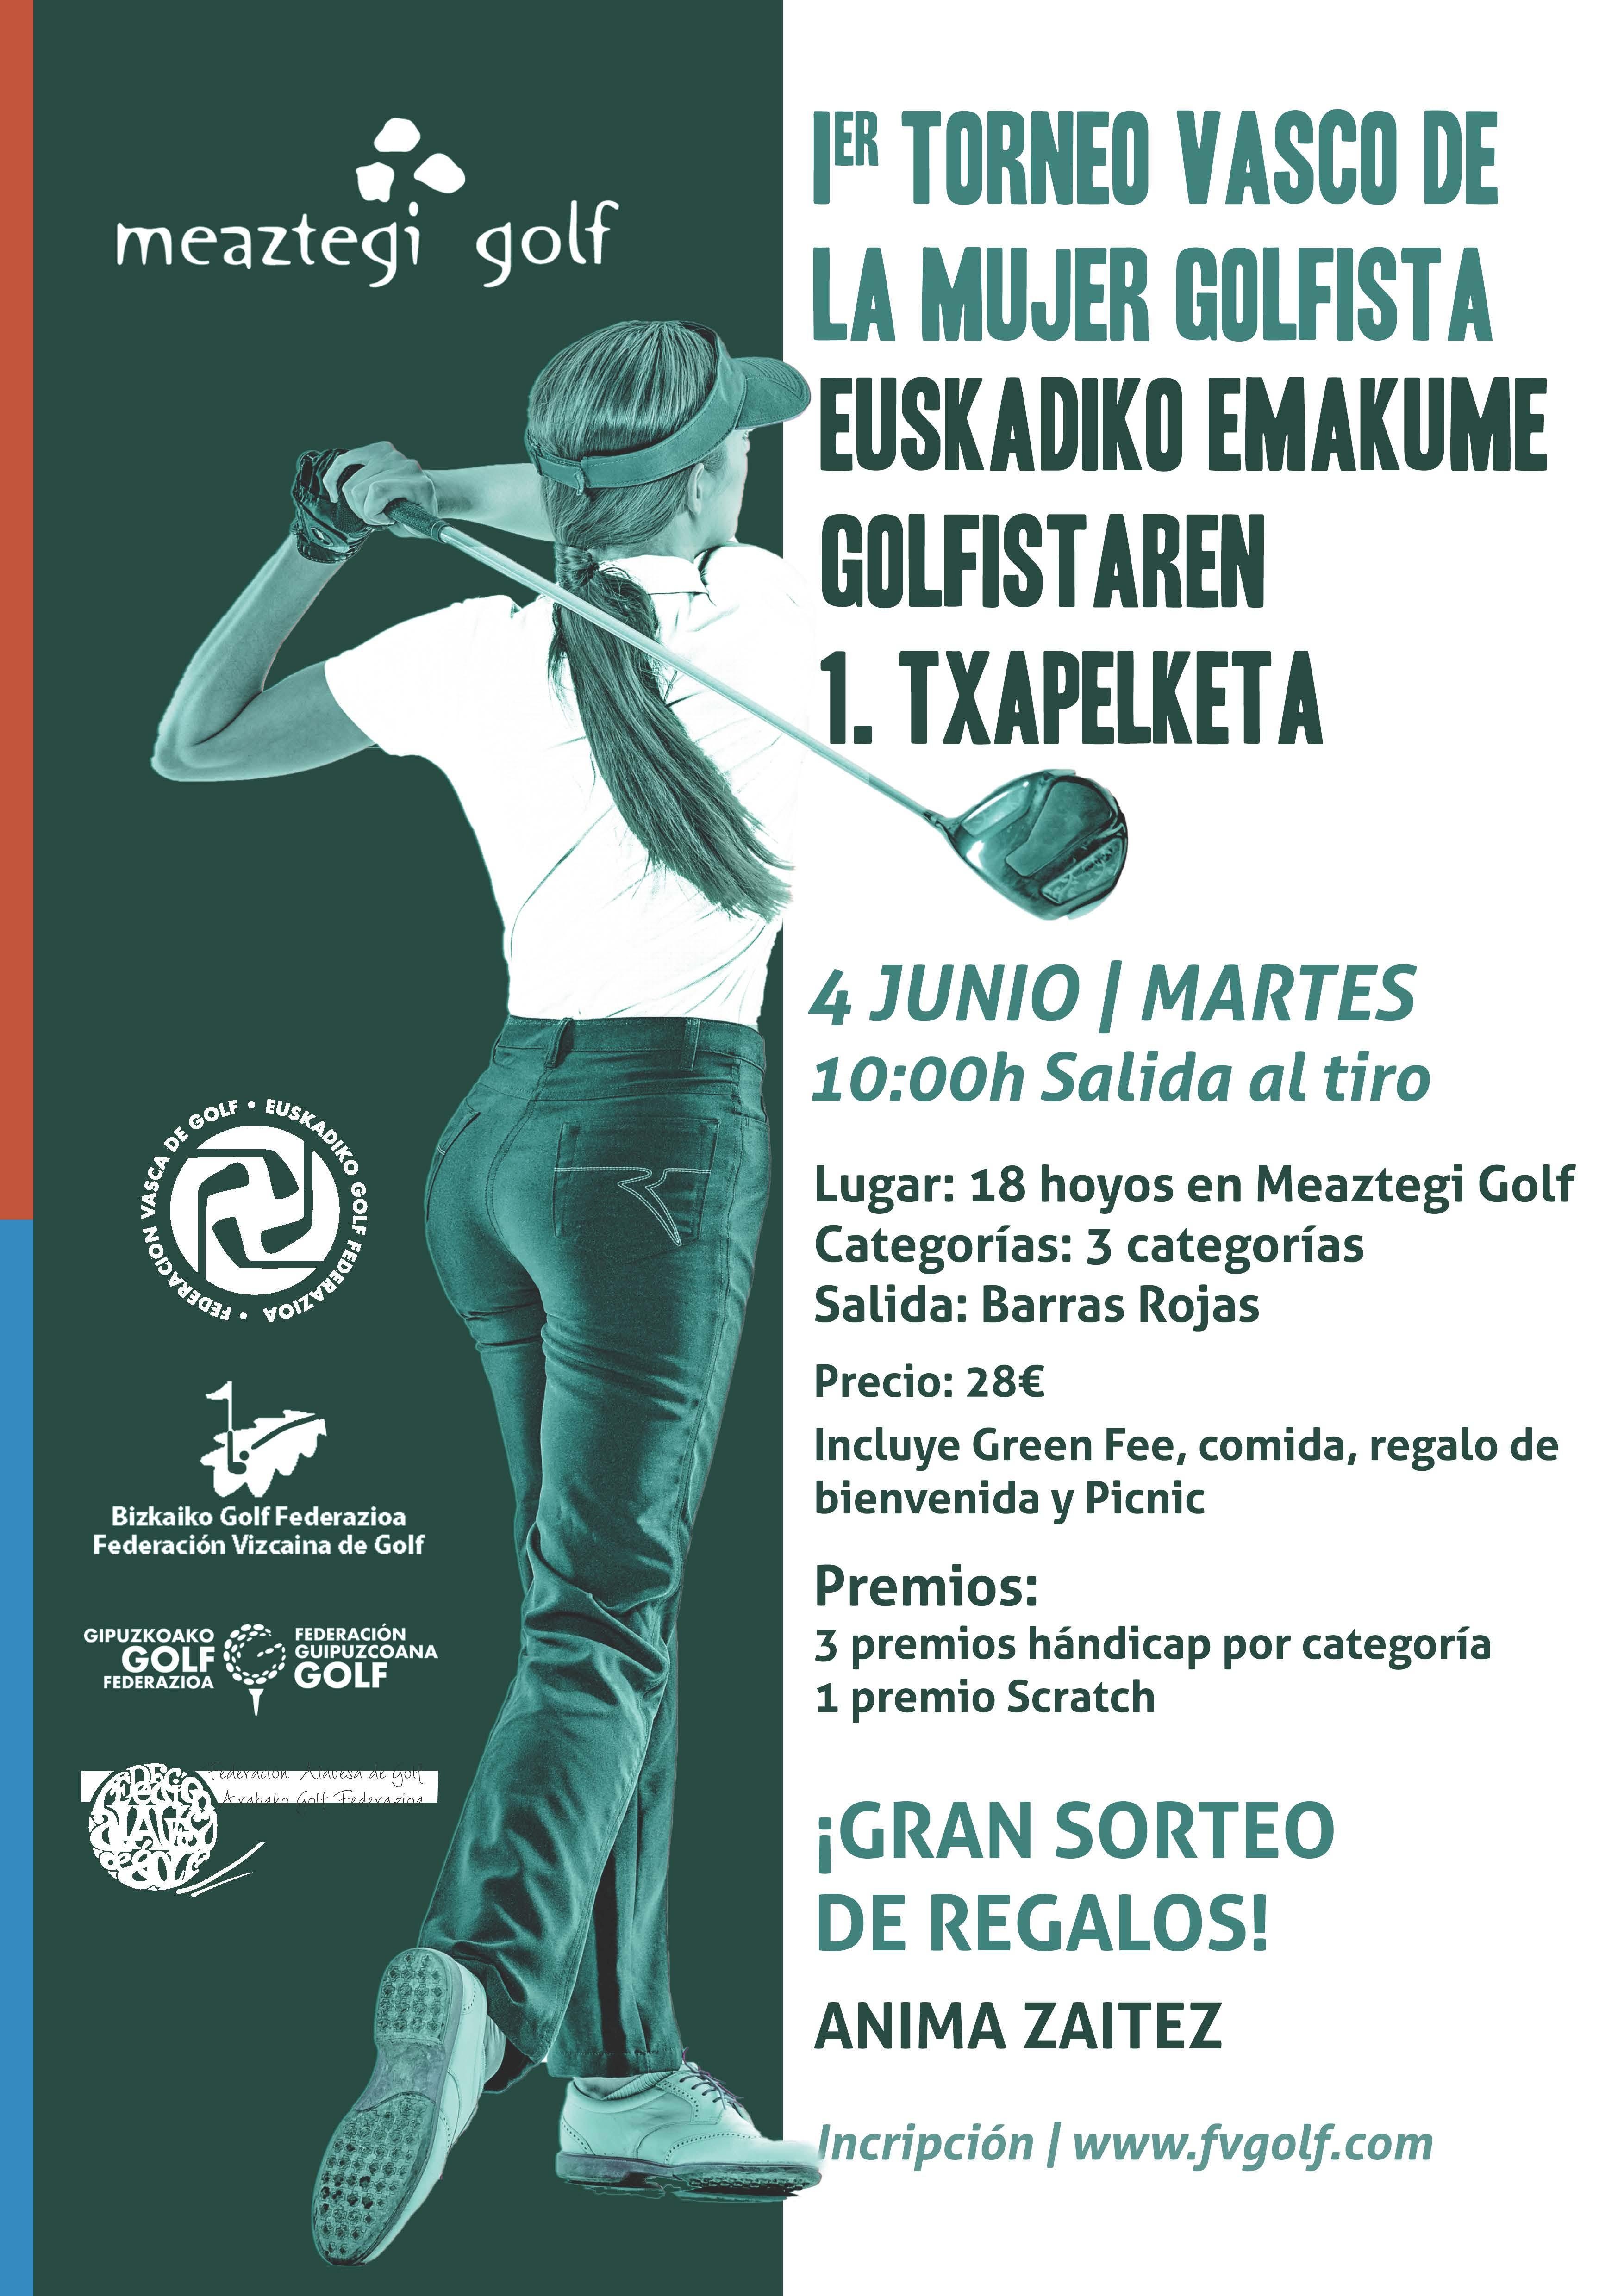 I Torneo País Vasco de la Mujer Golfista – 4 Junio Meaztegi Golf